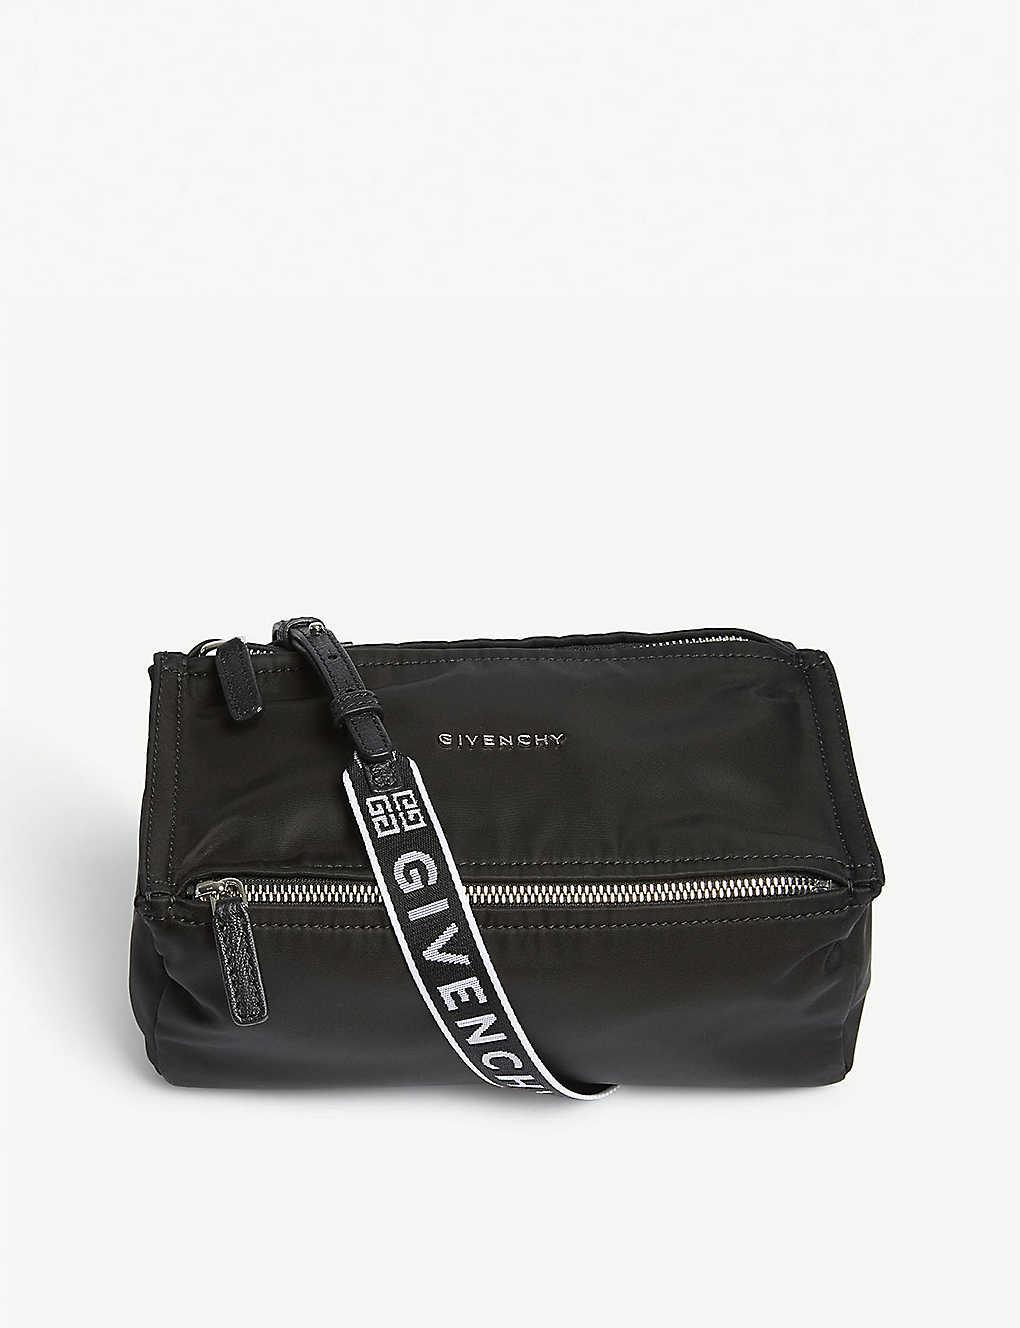 1c1e847c08b6 GIVENCHY - Pandora mini logo nylon messenger bag